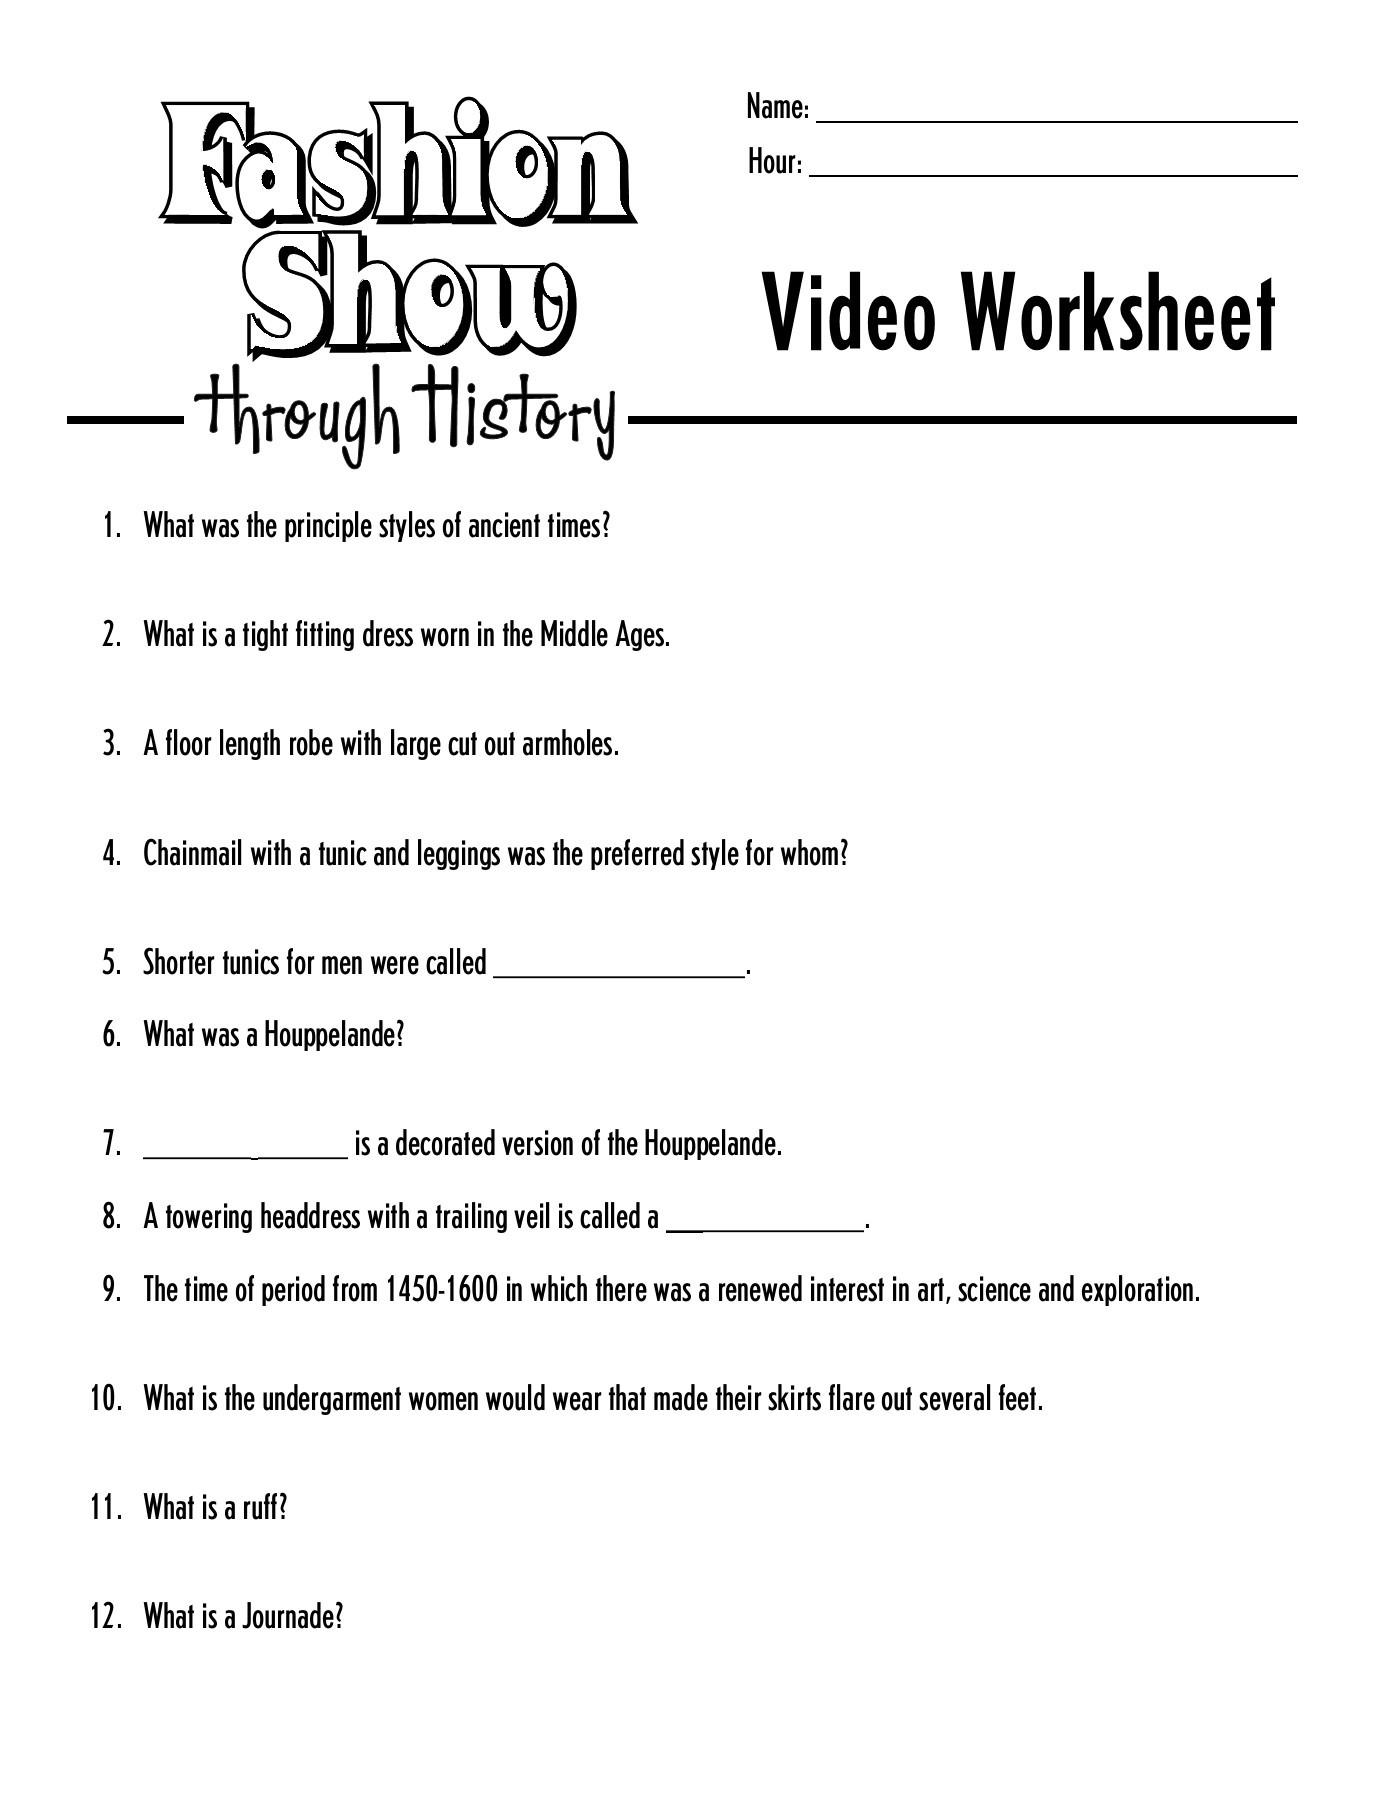 Learning Zonexpress Worksheet Answers